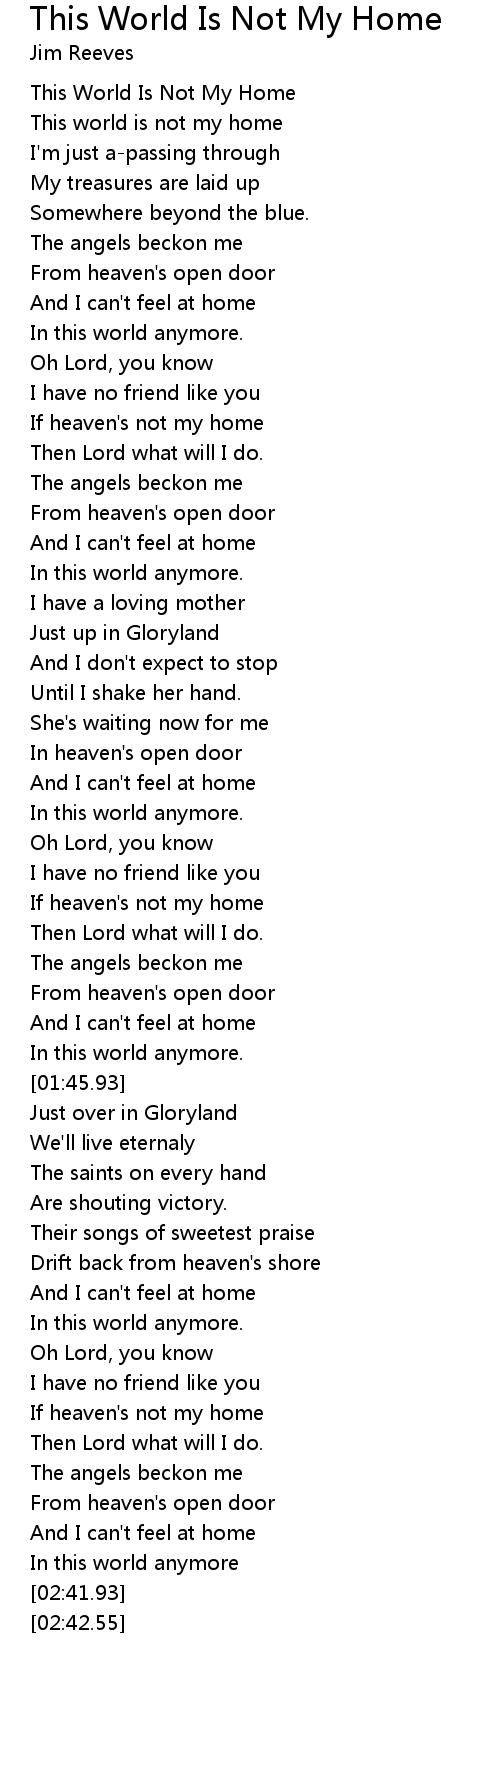 This Is Not My Home Lyrics : lyrics, World, Lyrics, Follow